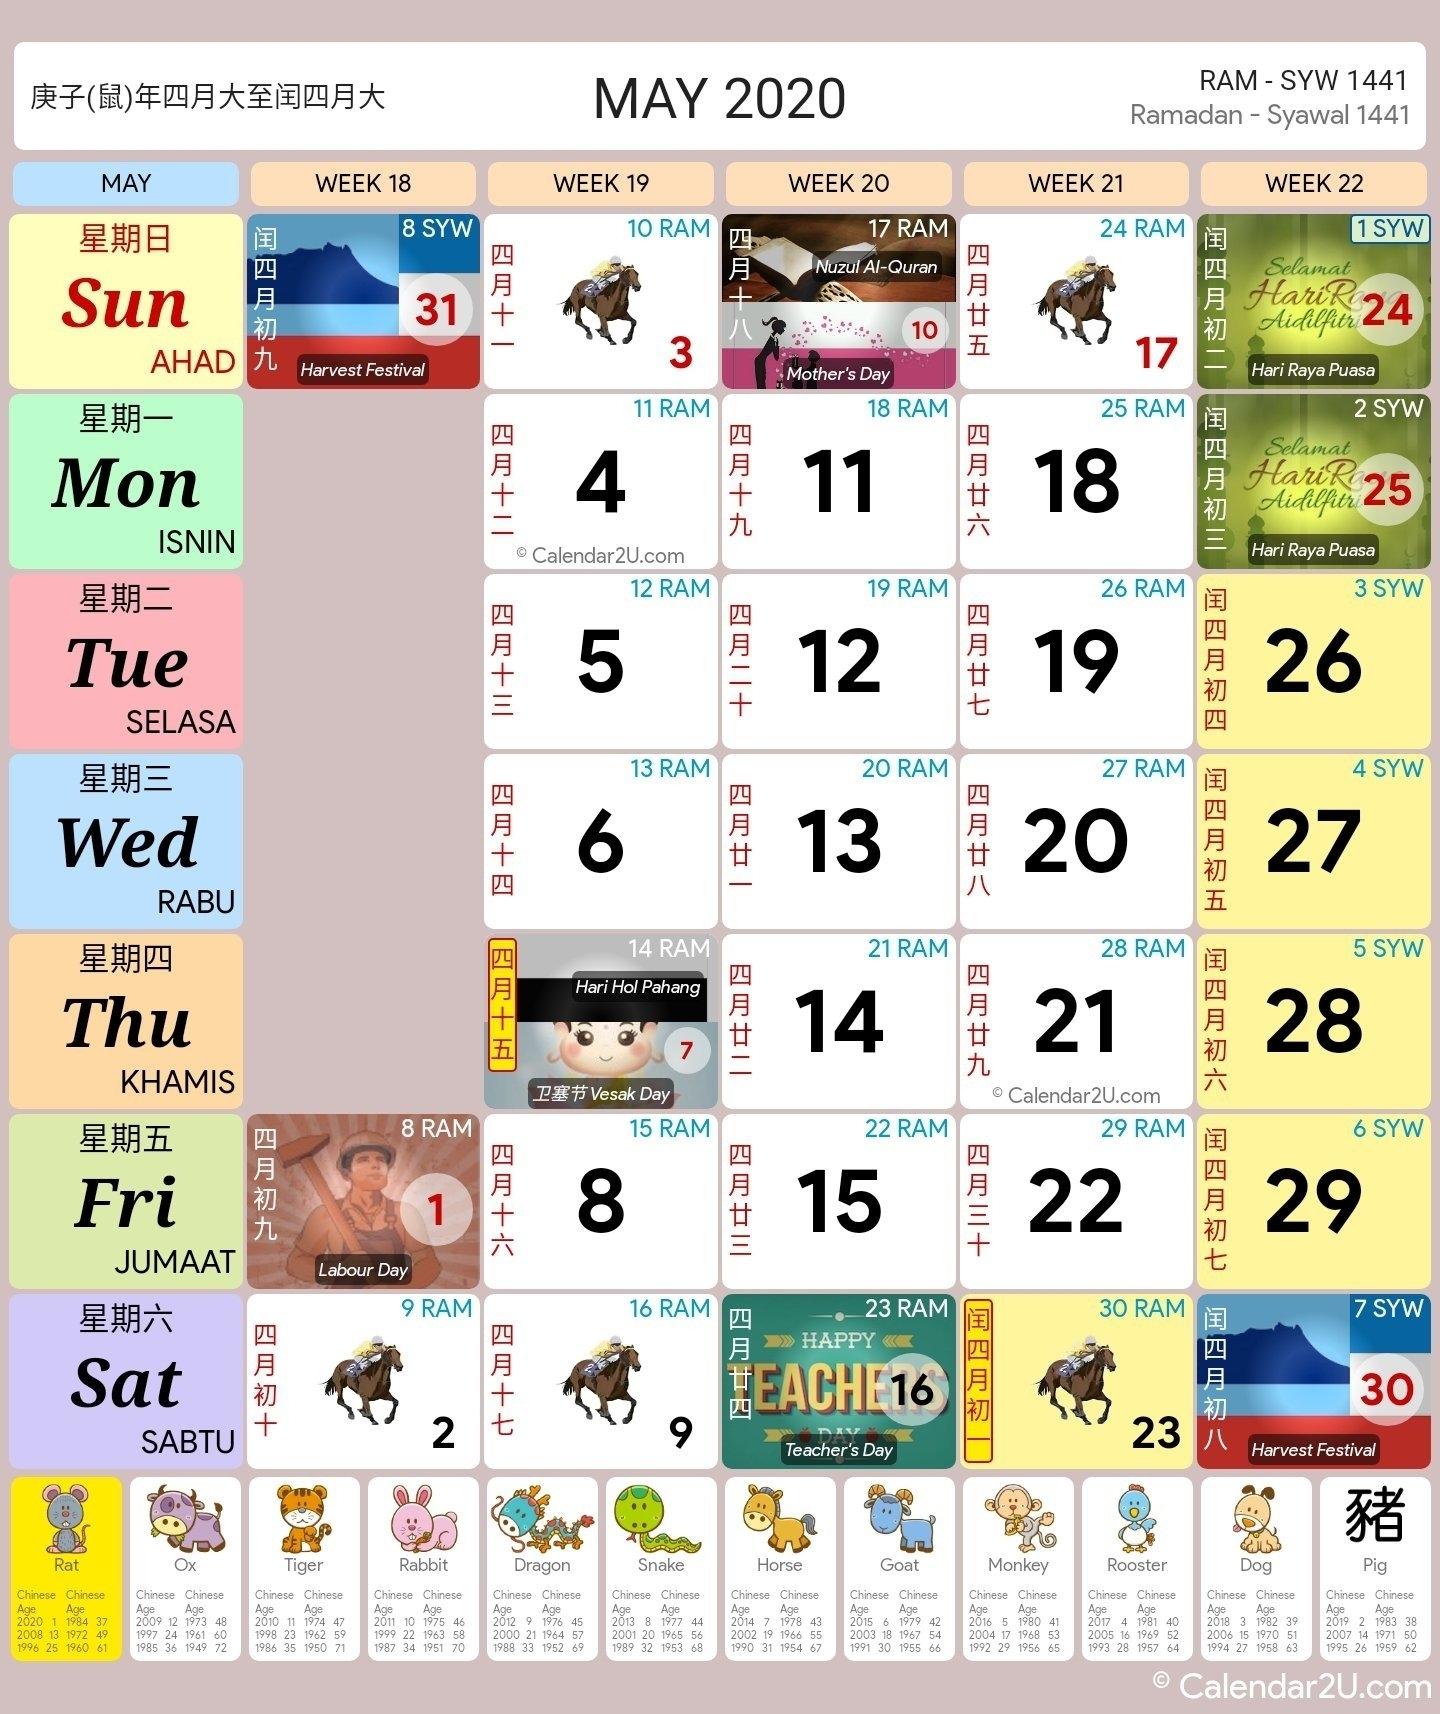 Calendar 2020 Free Printable Kuda - Calendar Inspiration Design in Kalendar Kuda 2021 Pdf Image